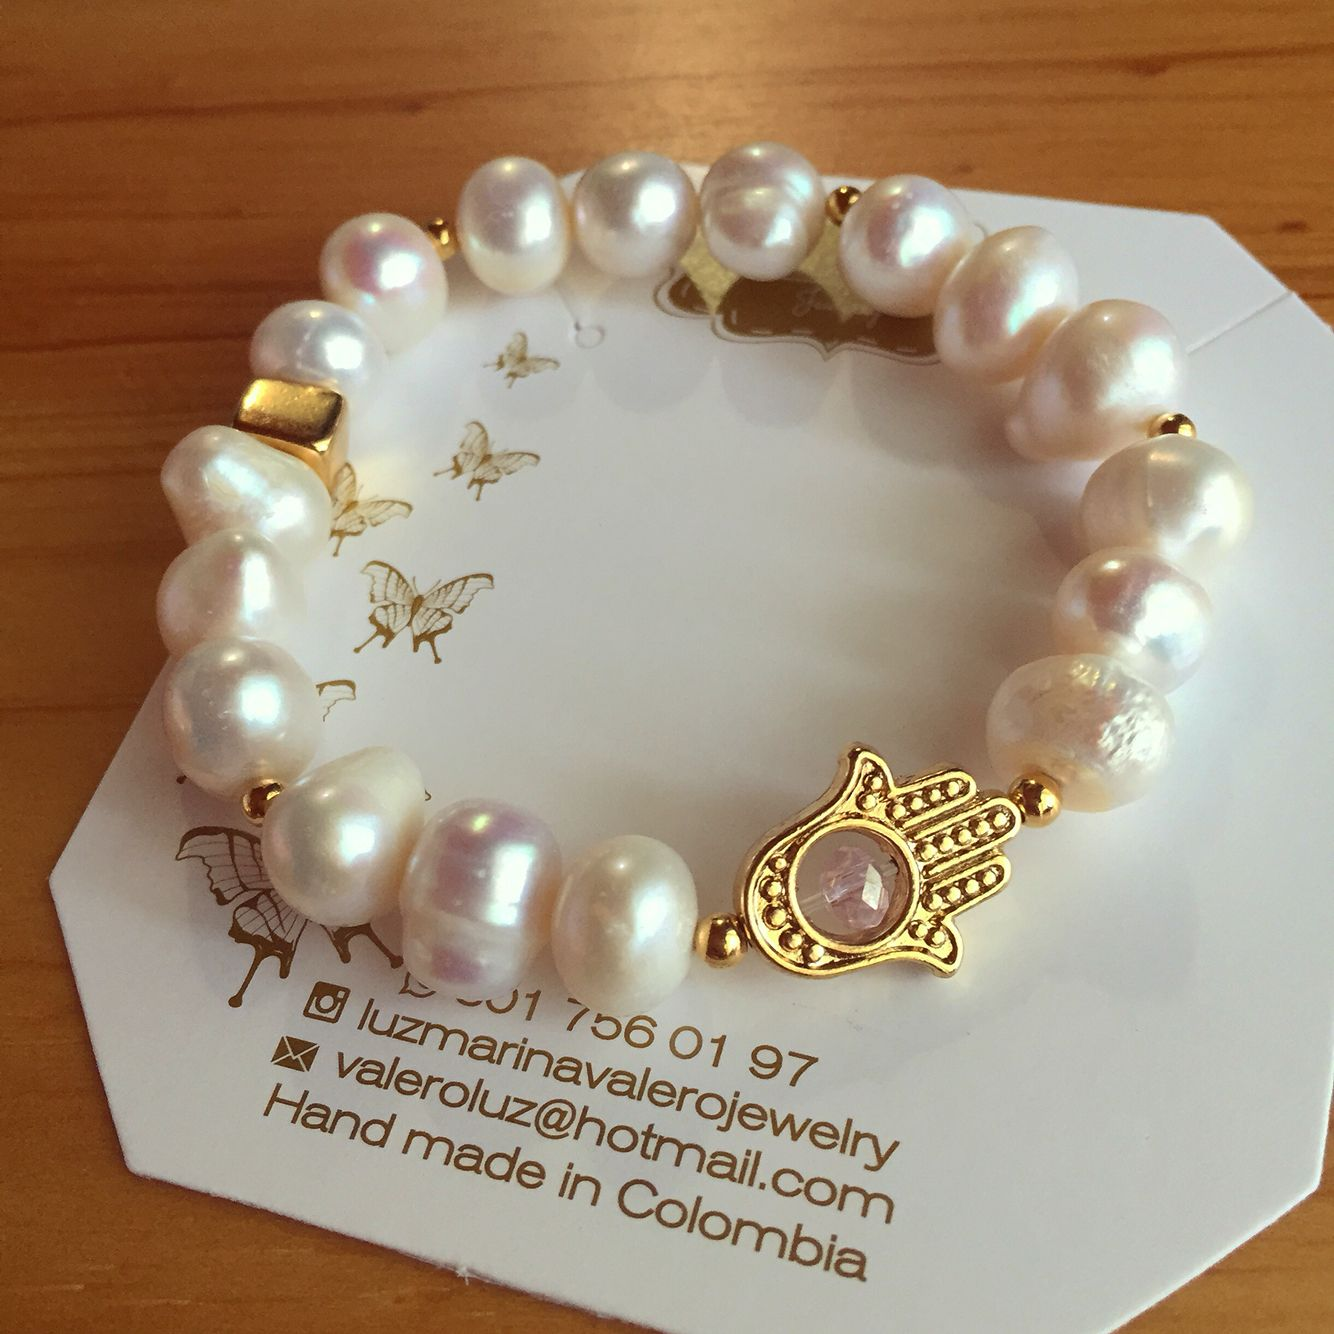 Valero Pearls perlas pulsera perlas perlas joyas pulseras de perlas